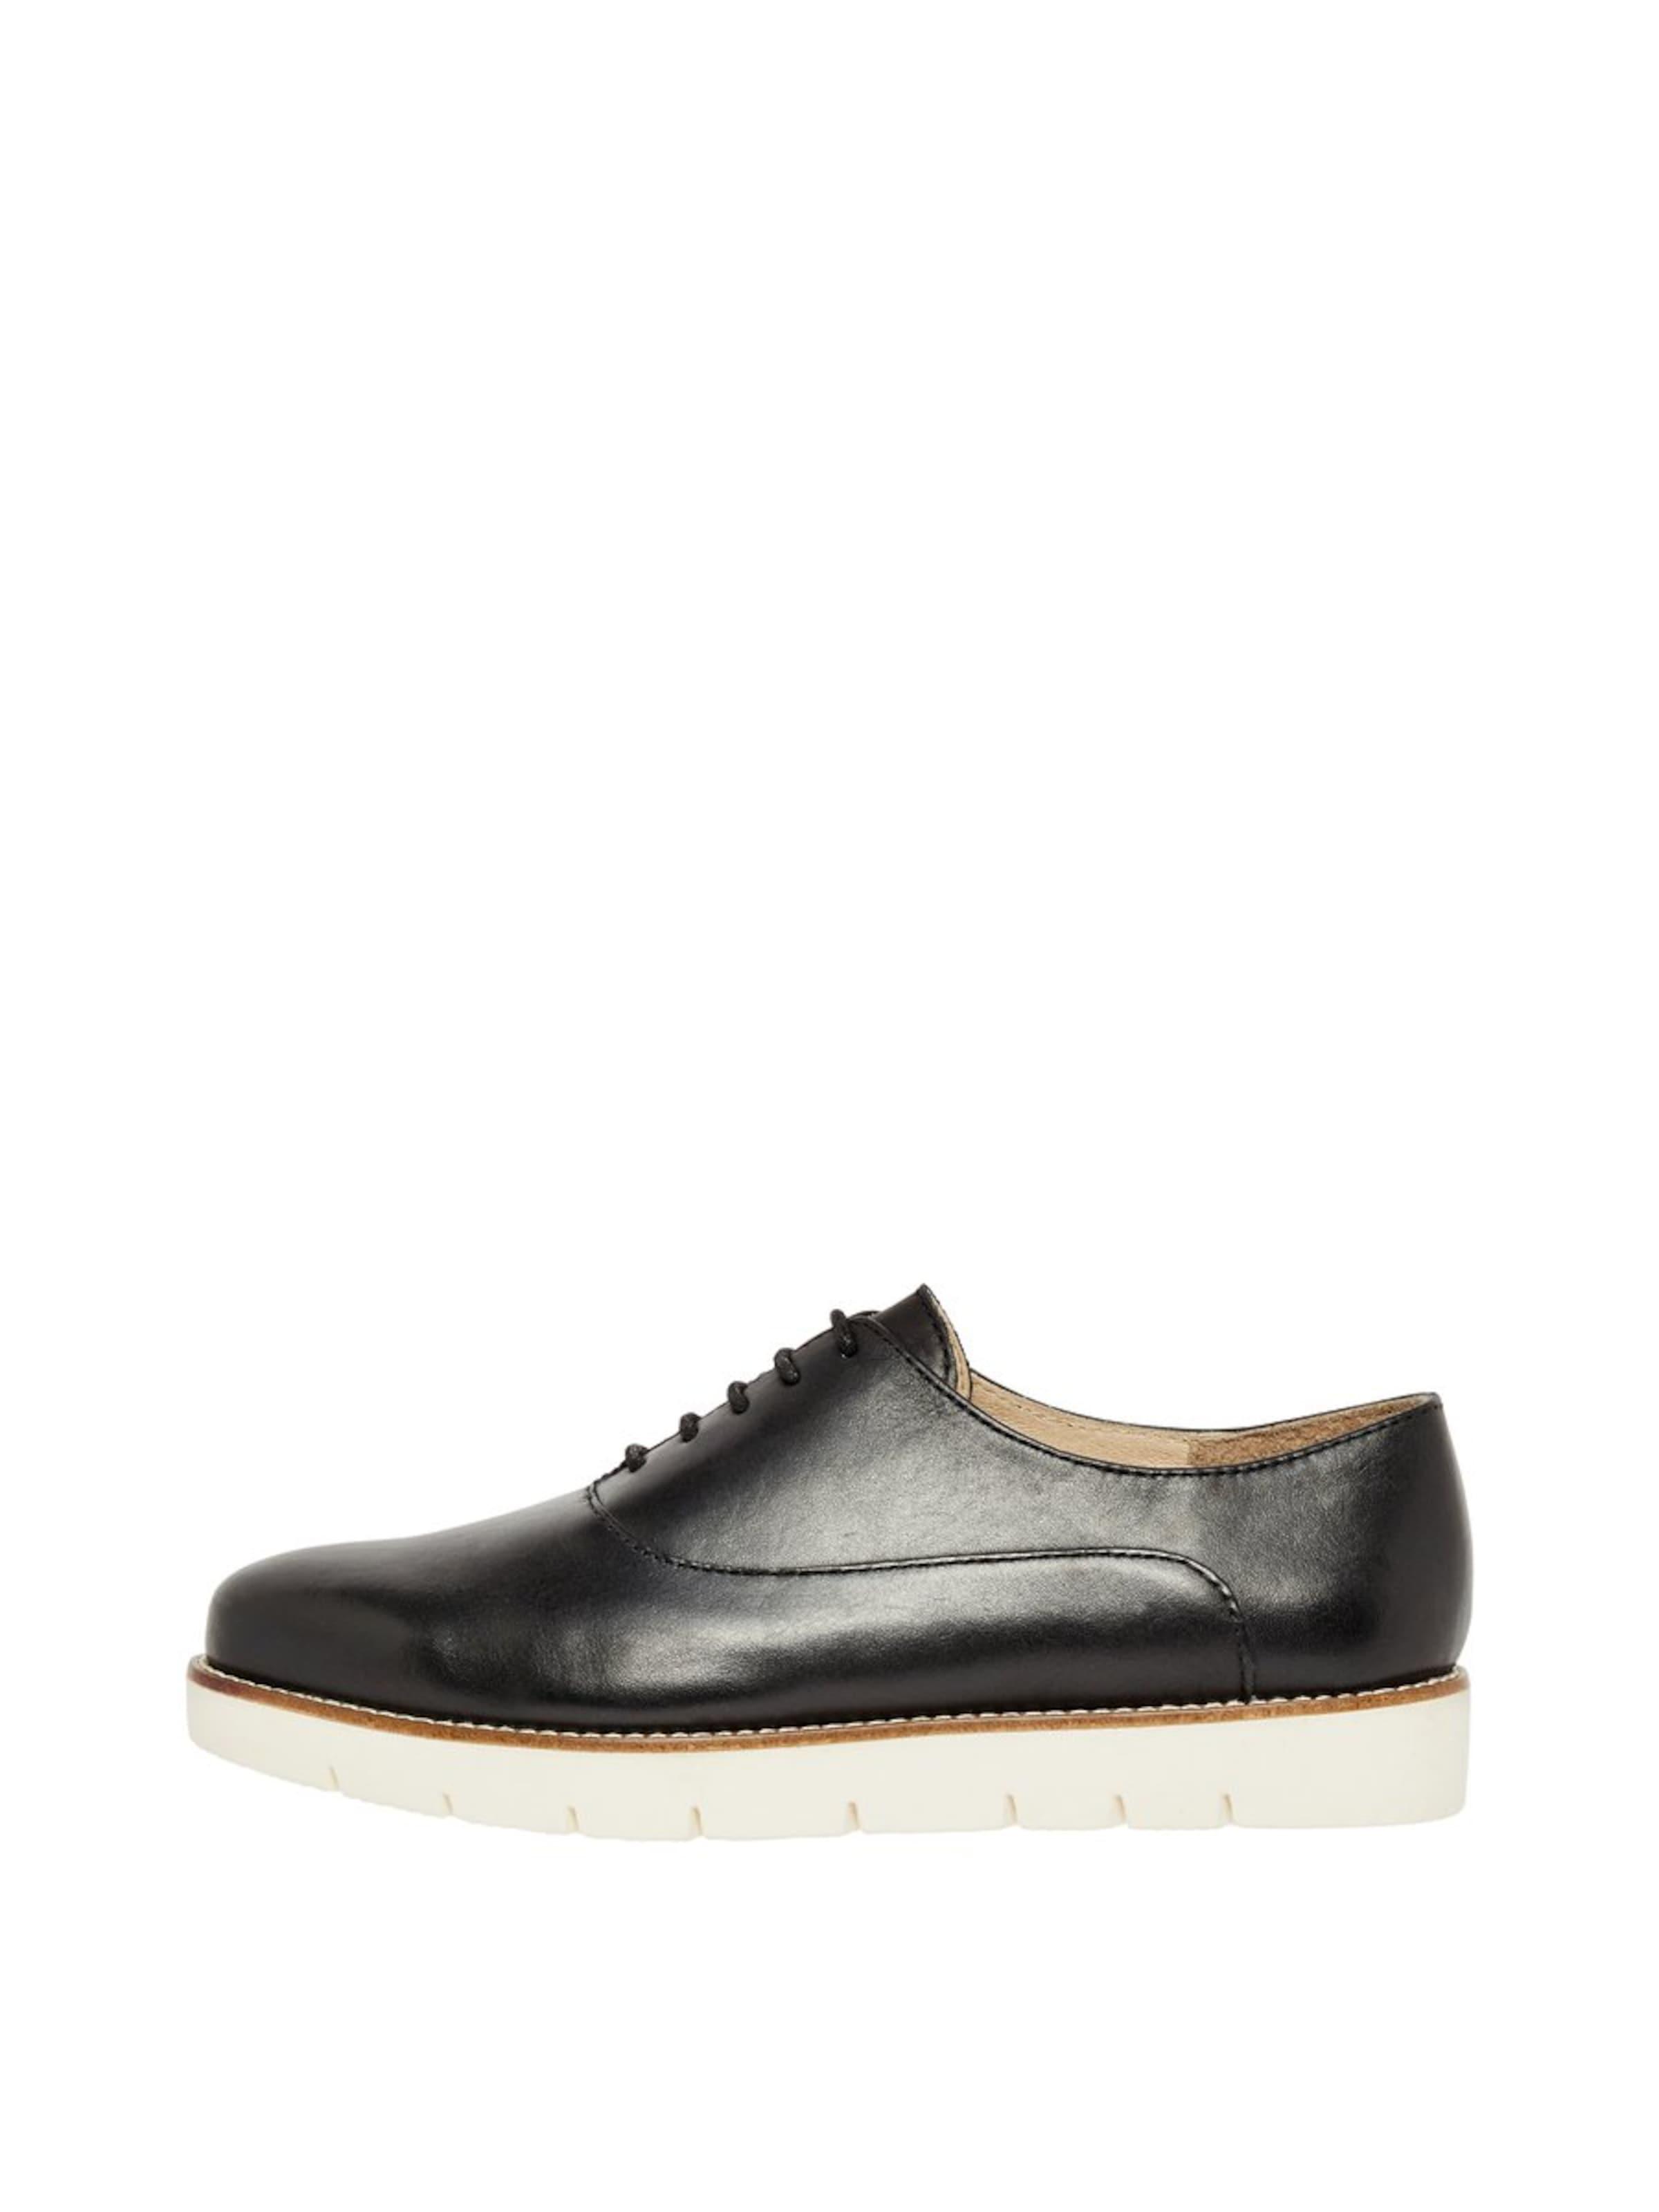 Schuhe Bianco Schwarz Schwarz Bianco In In Schwarz Bianco Schuhe In Schuhe Bianco 8n0Nmwv